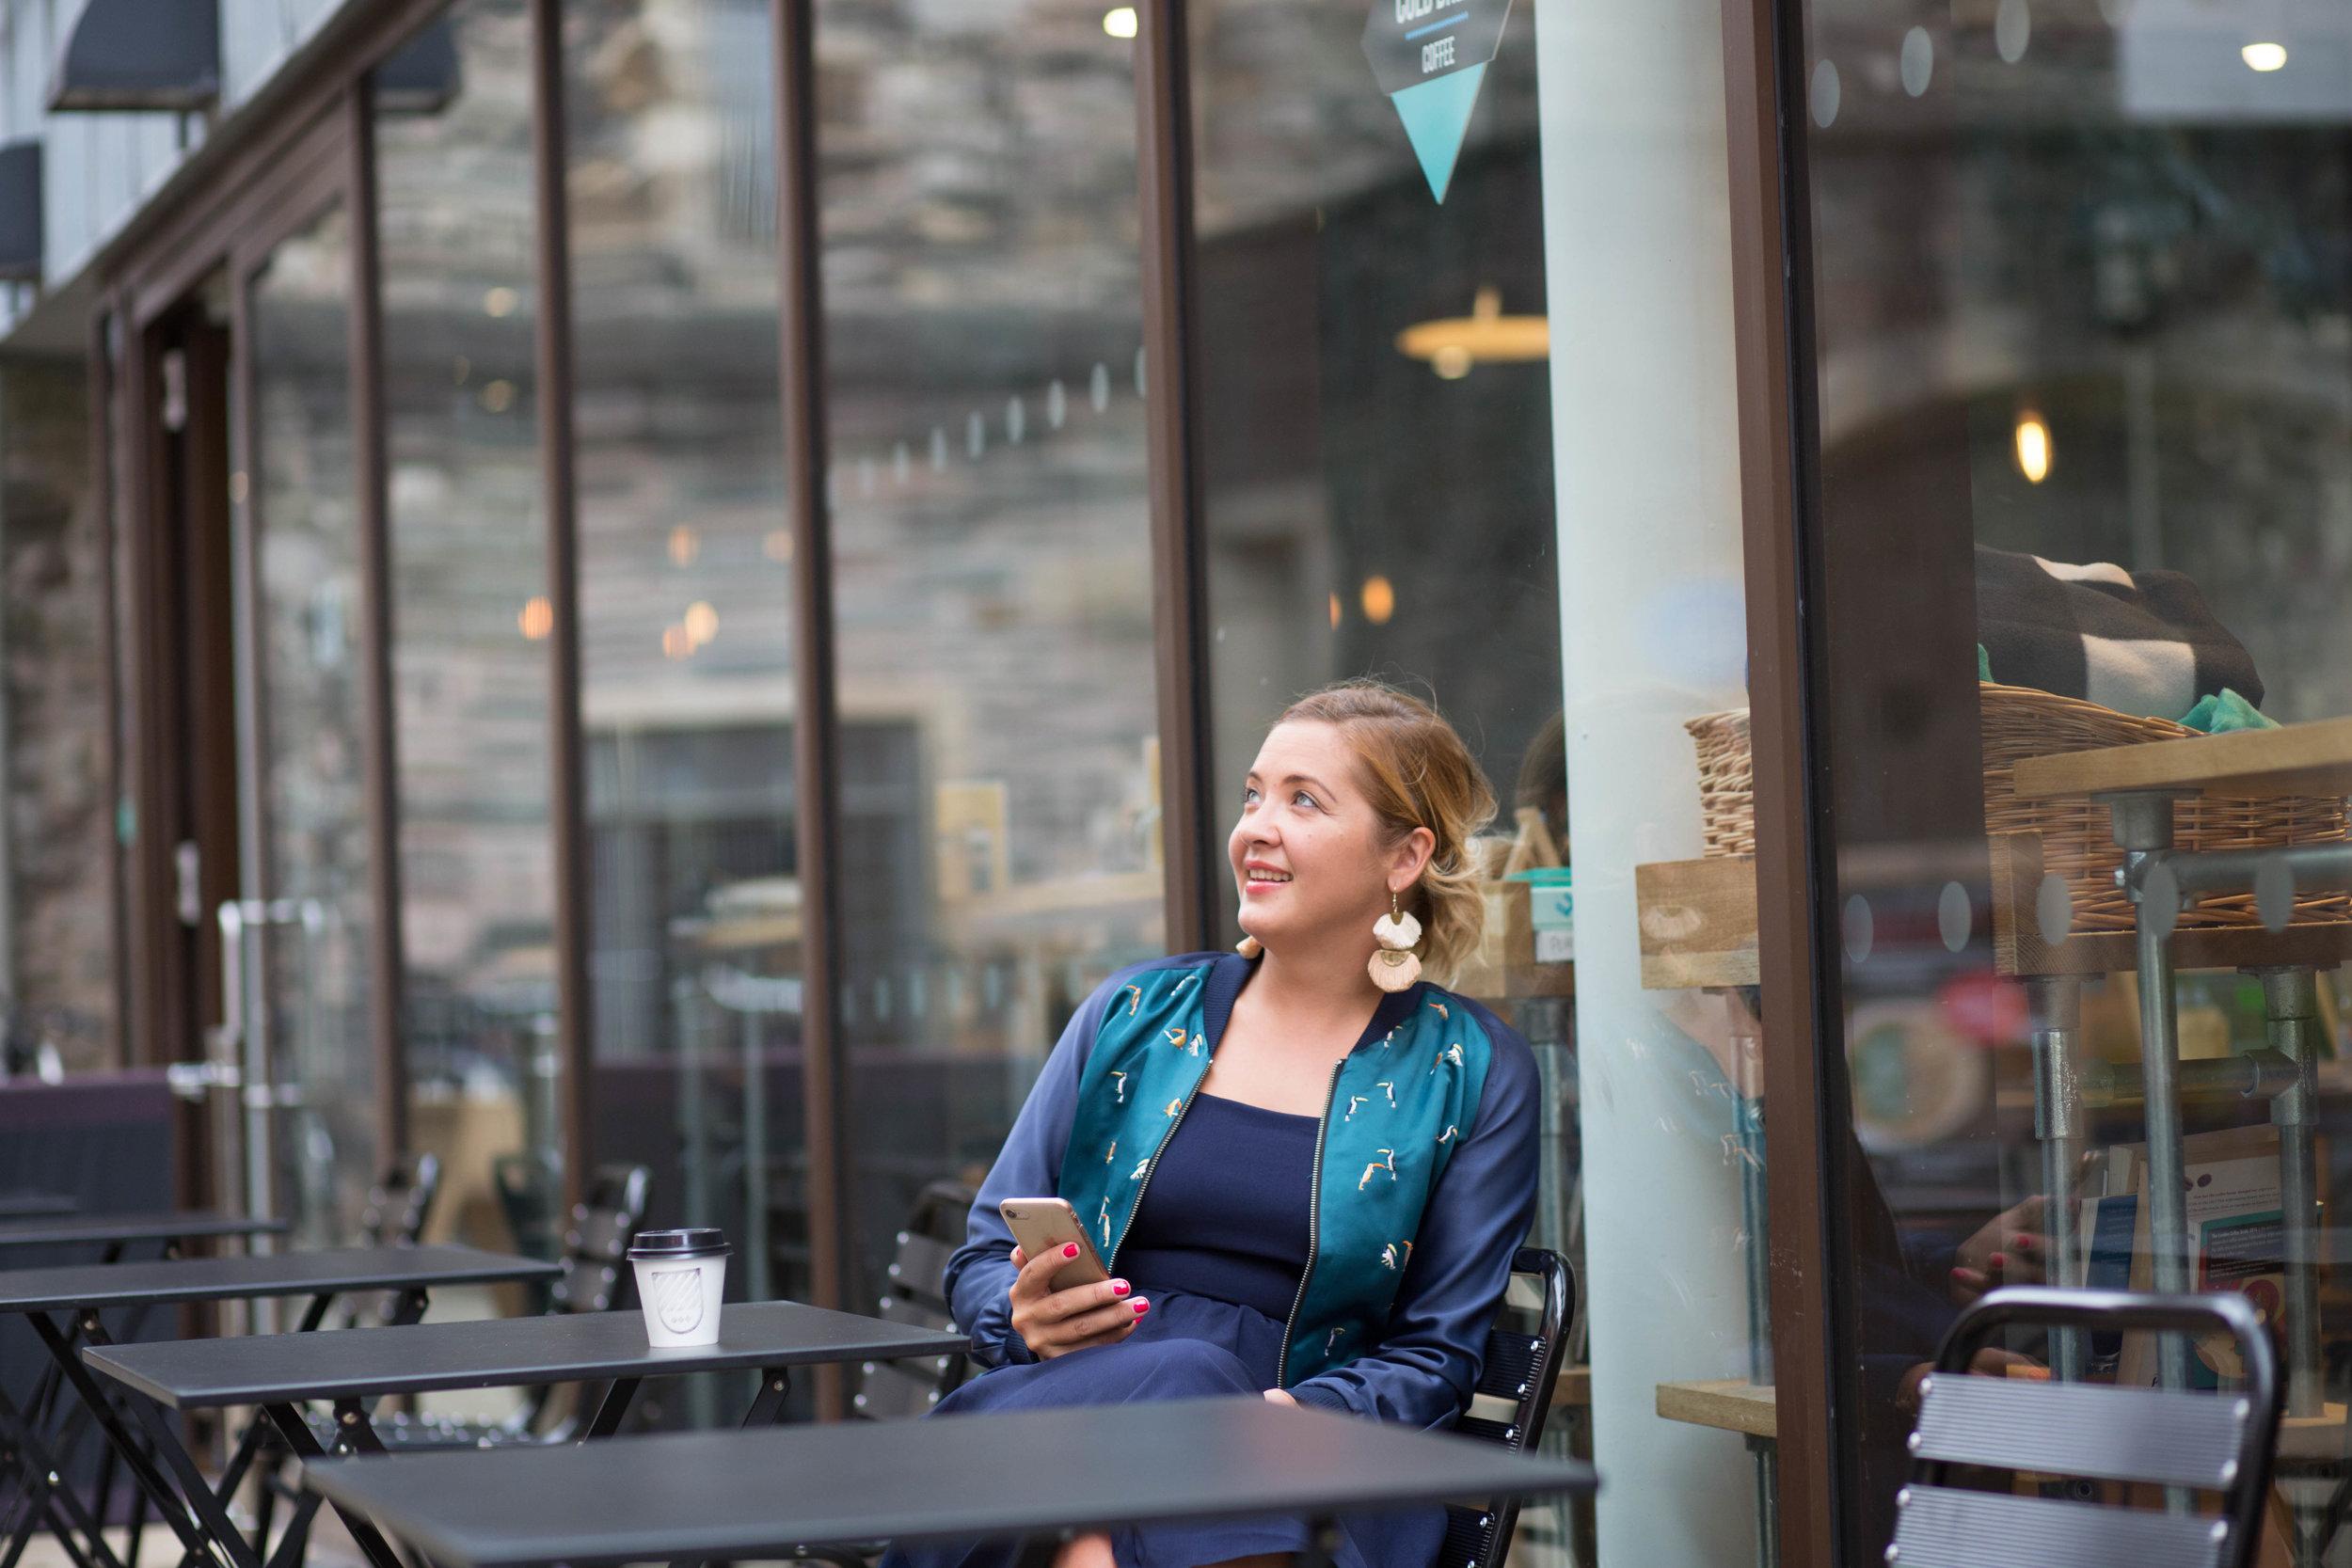 enterprise nation online masterclass with Lidia Drzewiecka